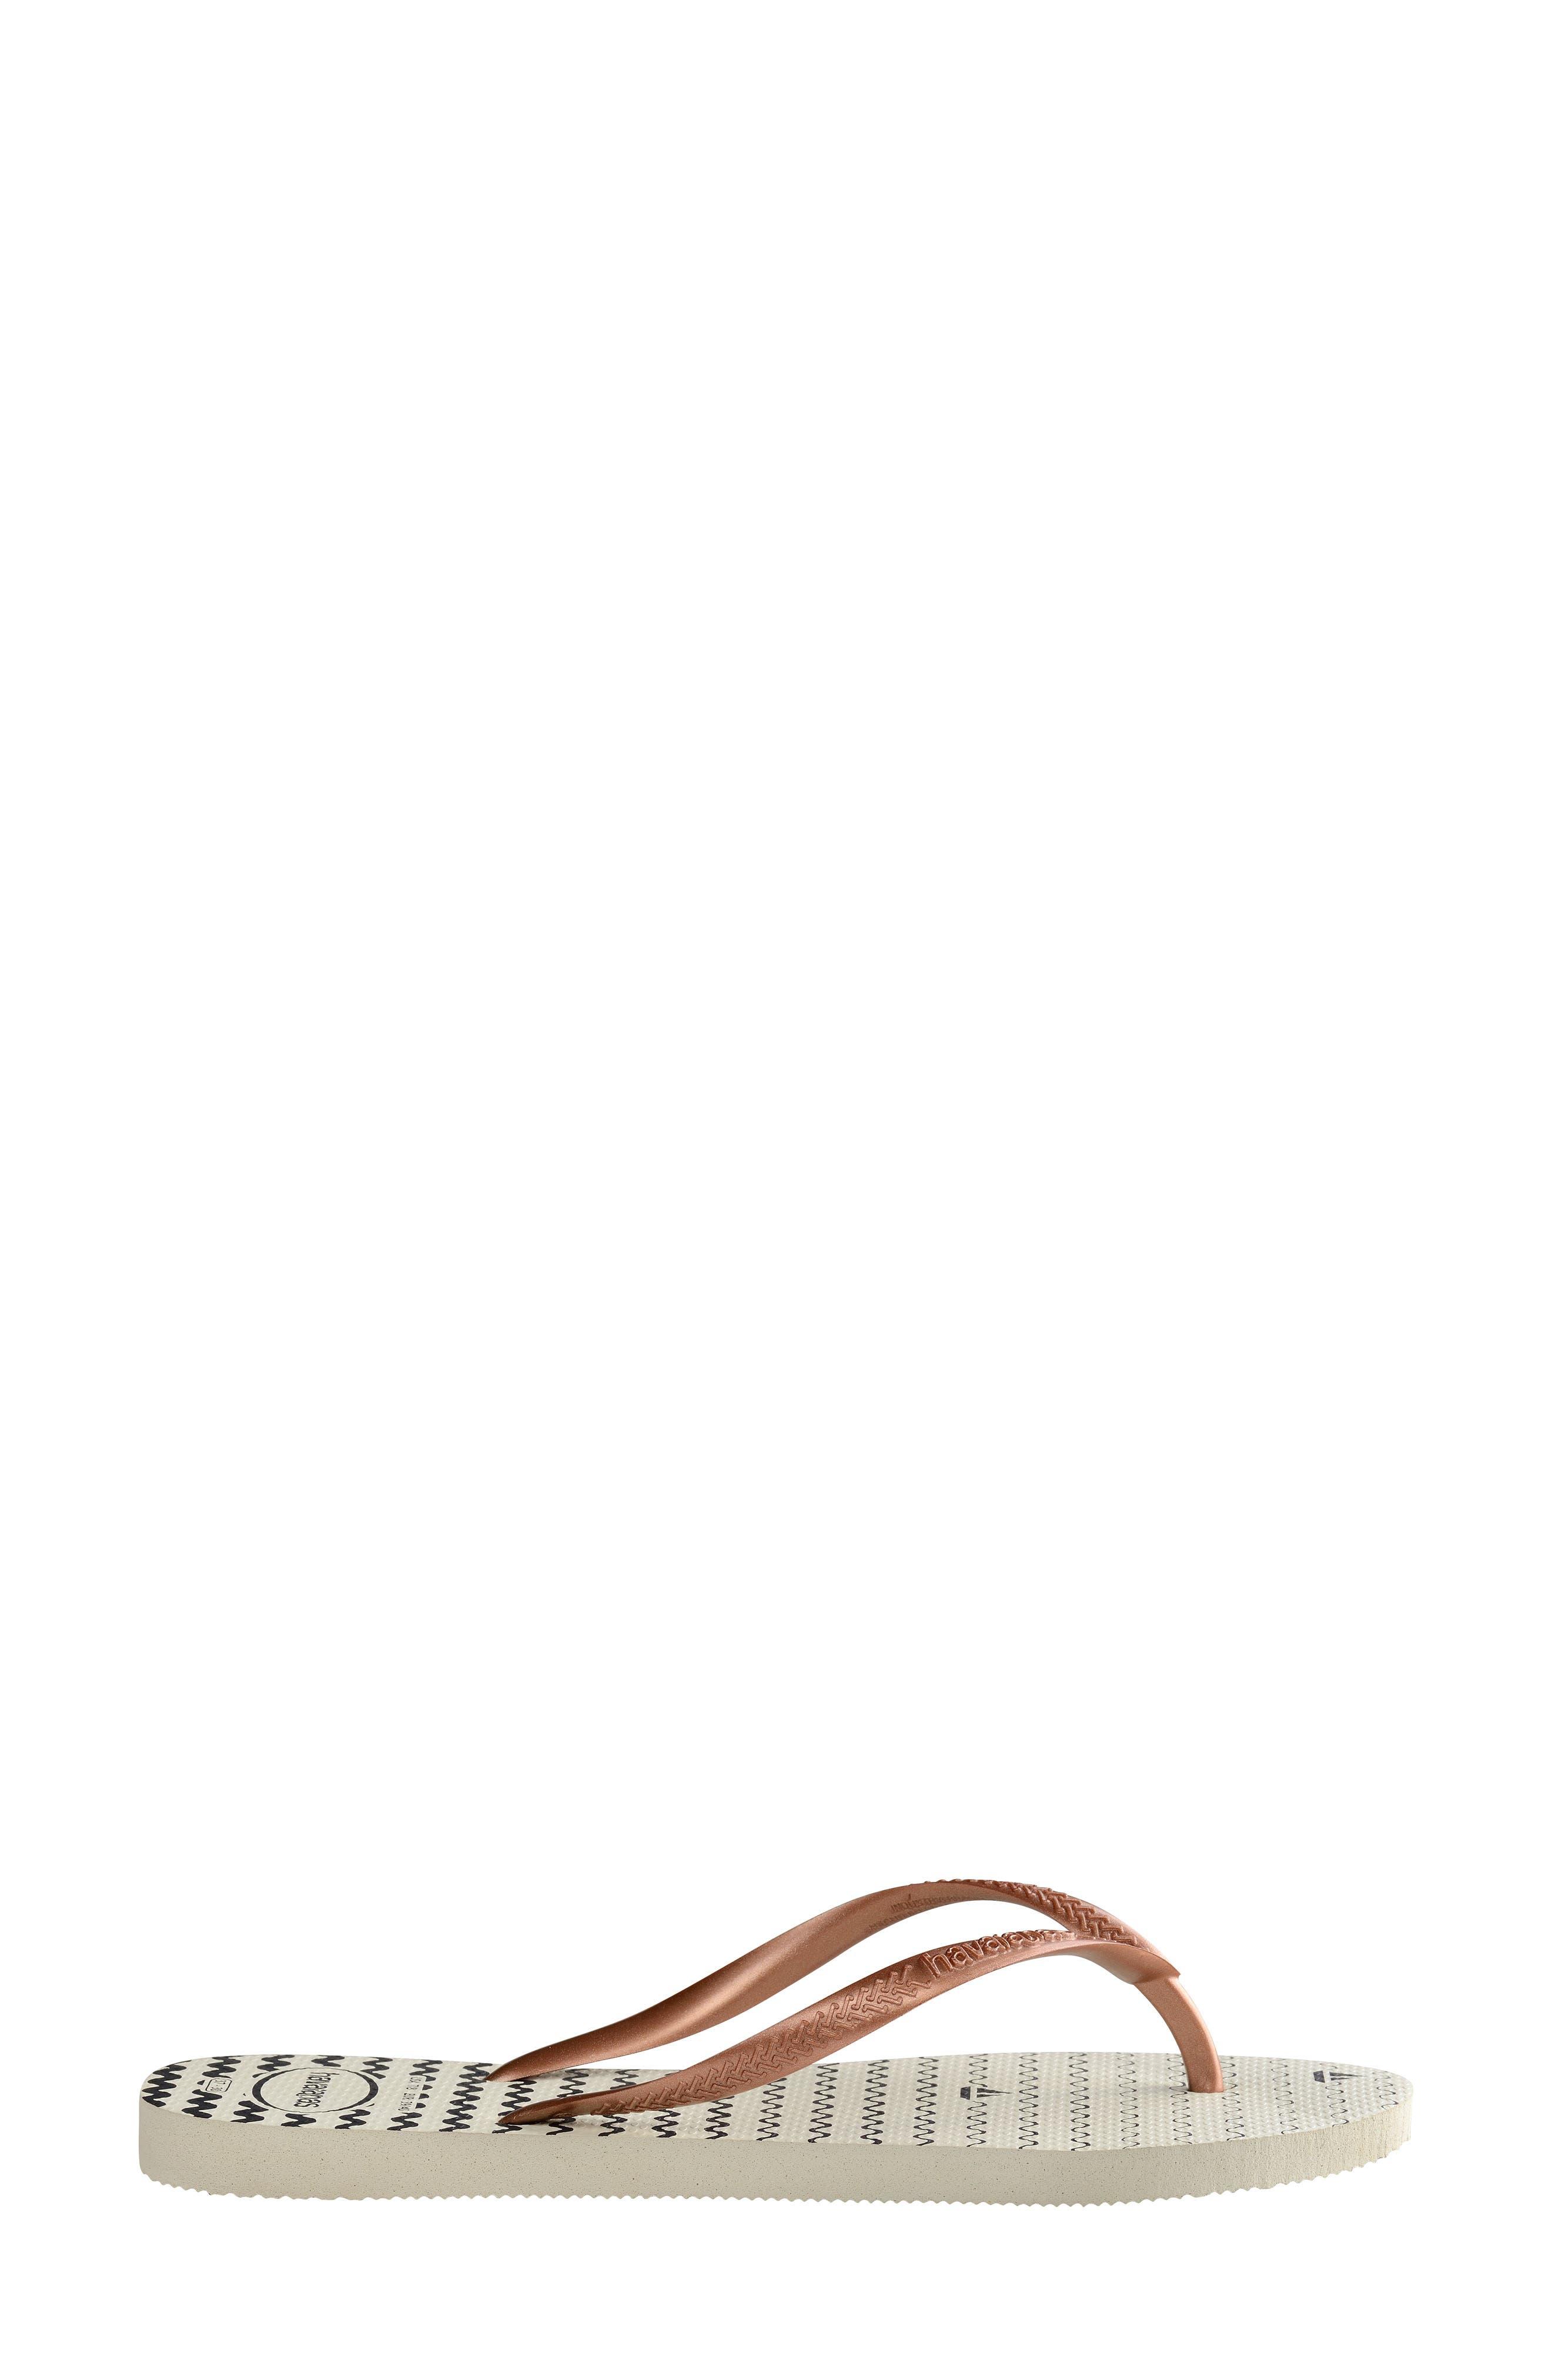 HAVAIANAS, Slim Oceano Flip Flop, Alternate thumbnail 3, color, WHITE